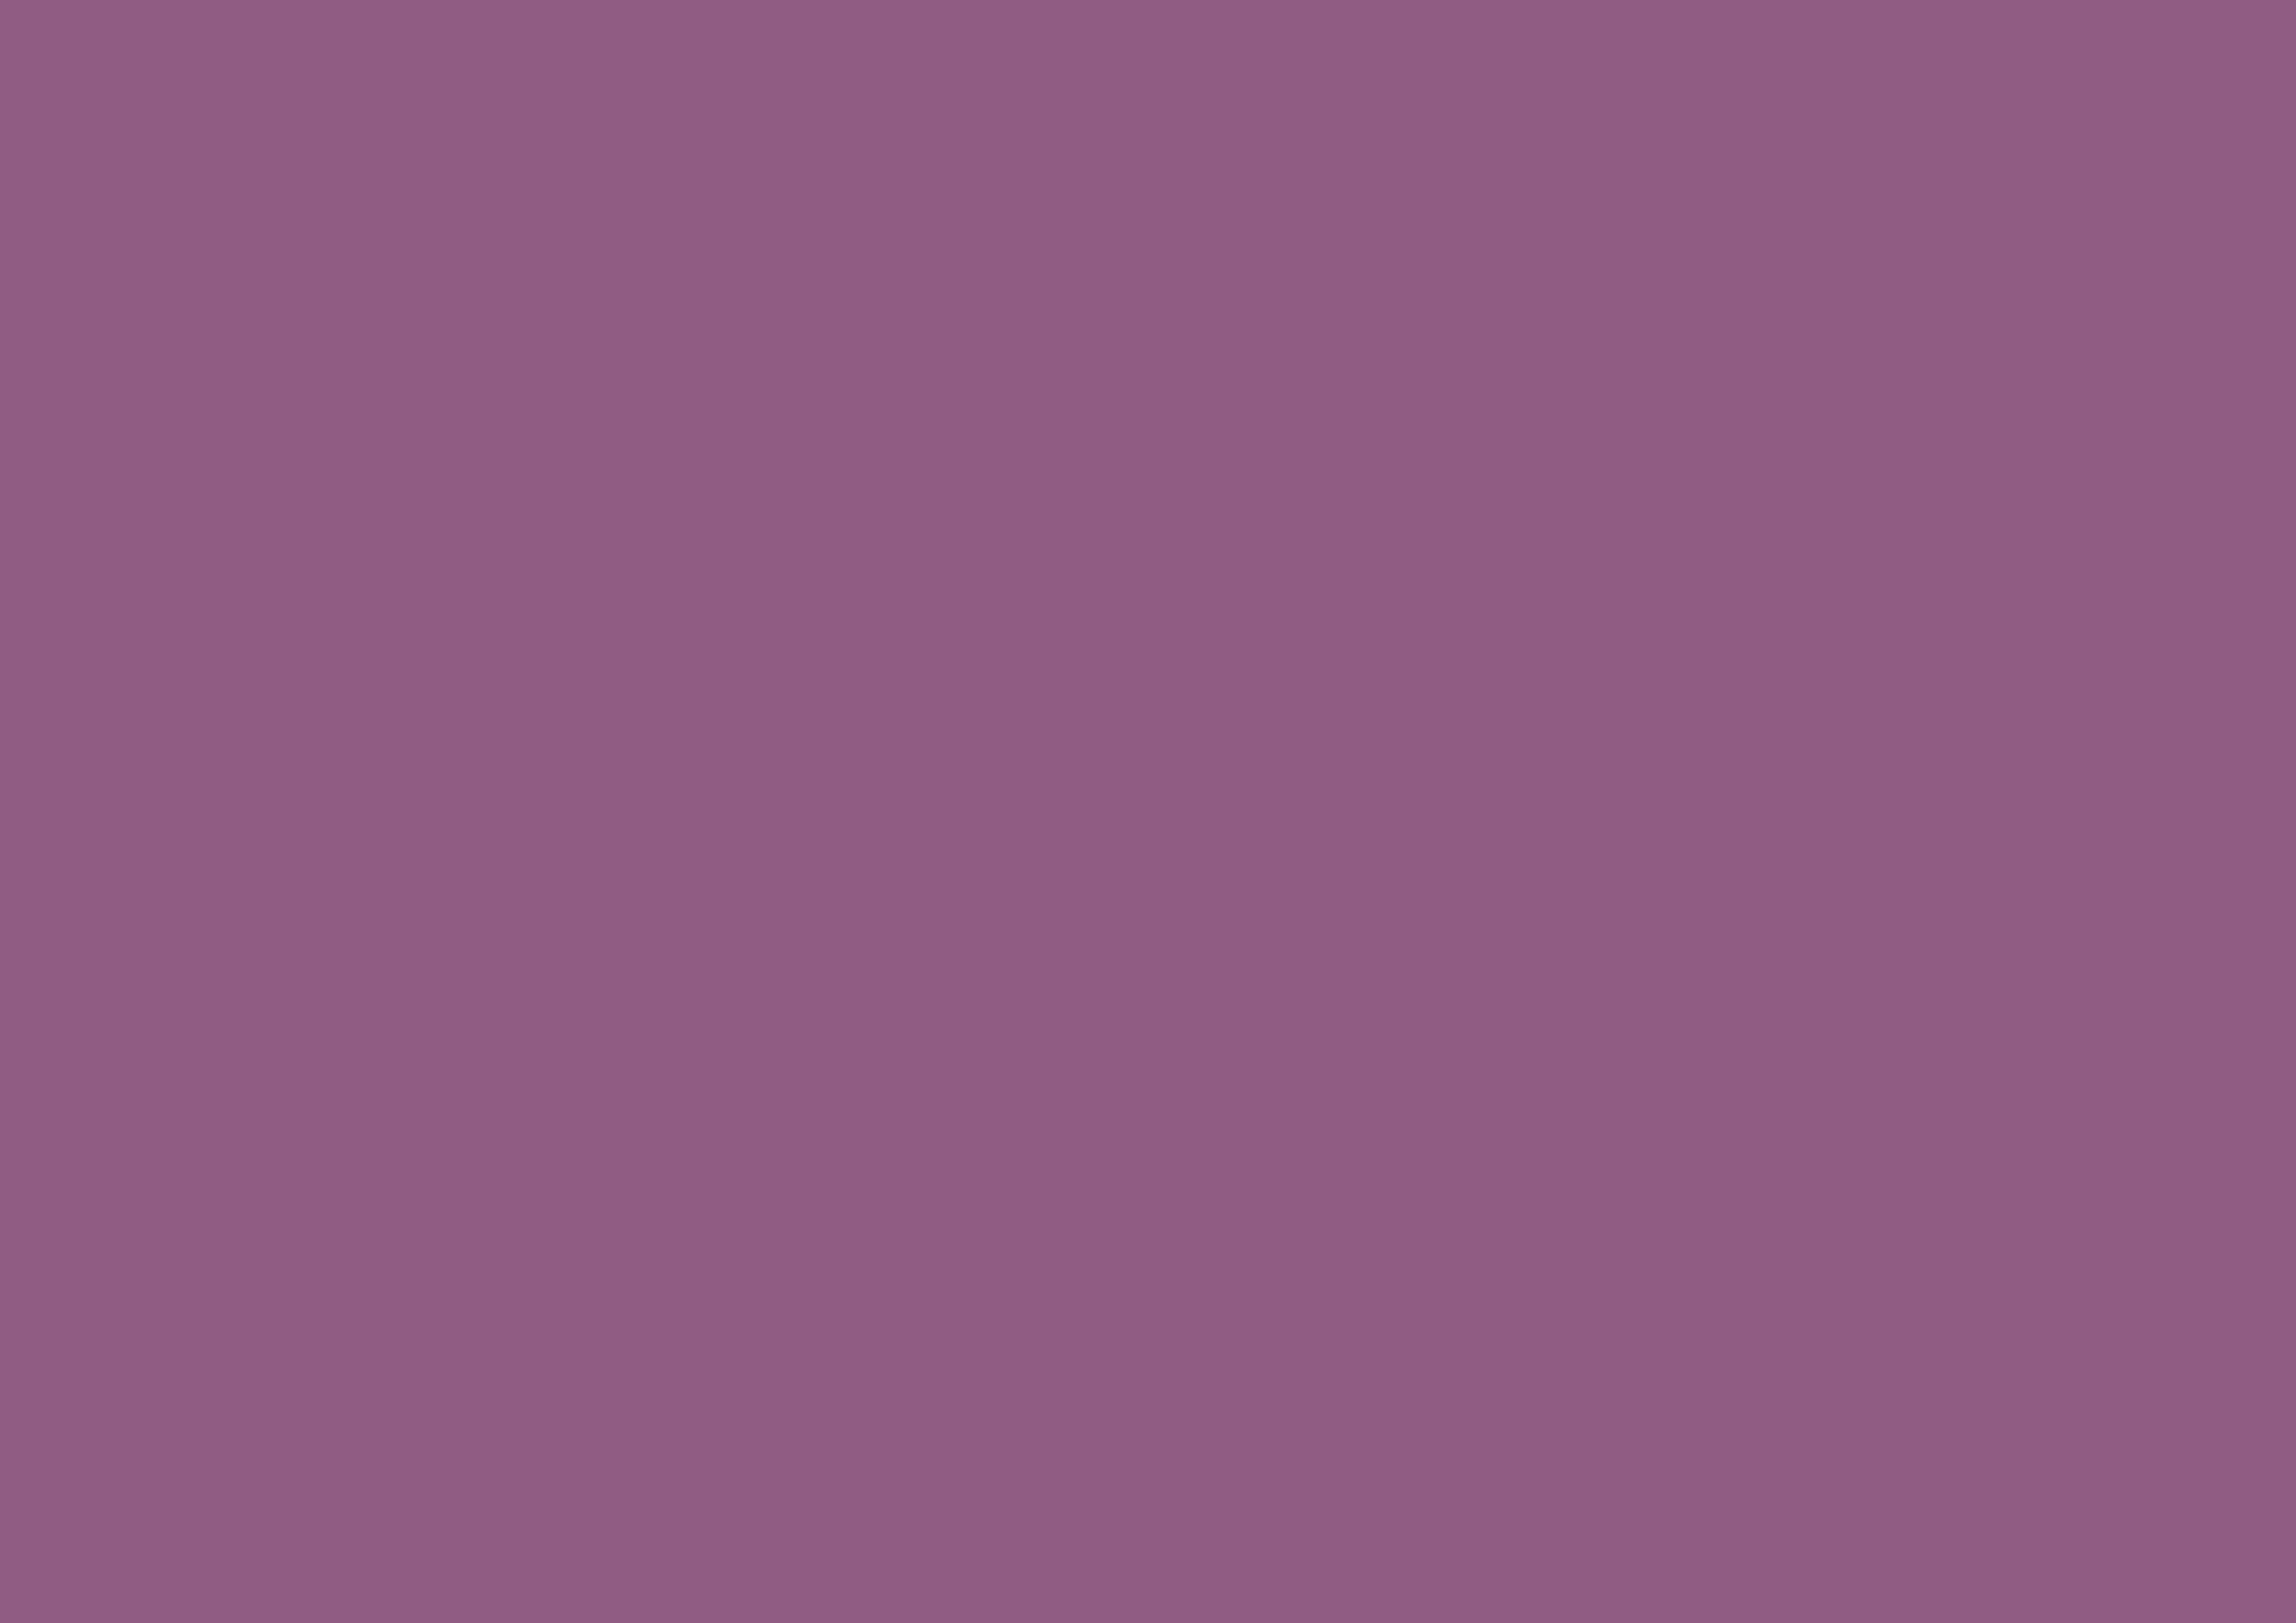 3508x2480 Antique Fuchsia Solid Color Background